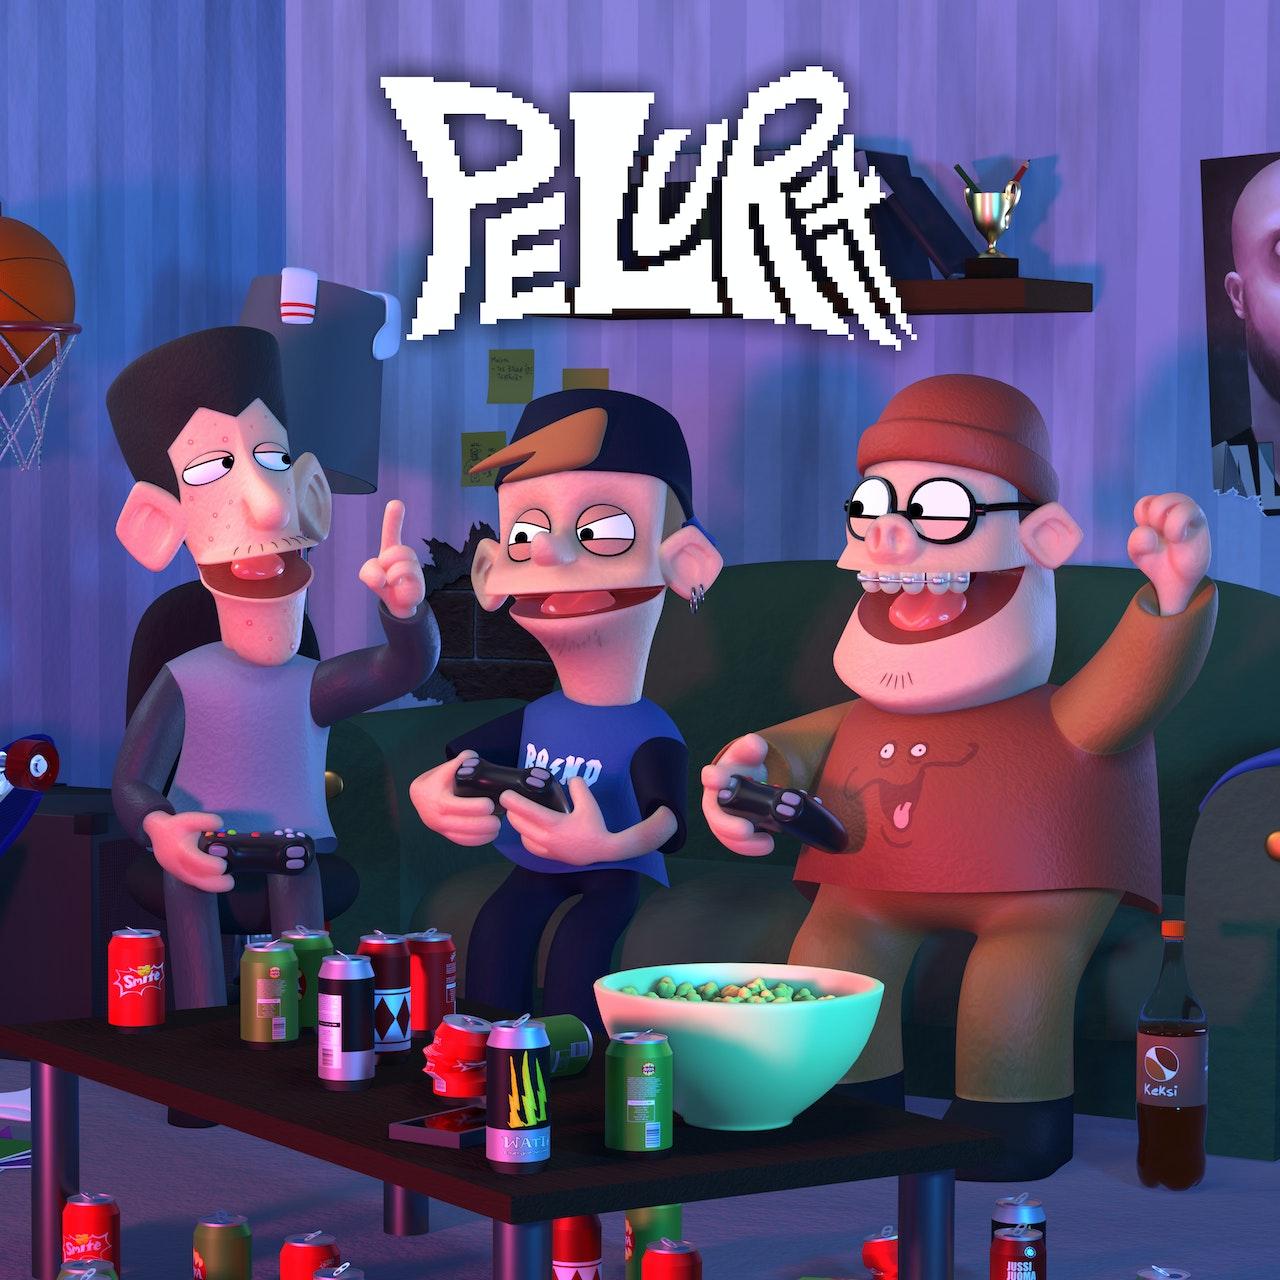 Pelurit is released!